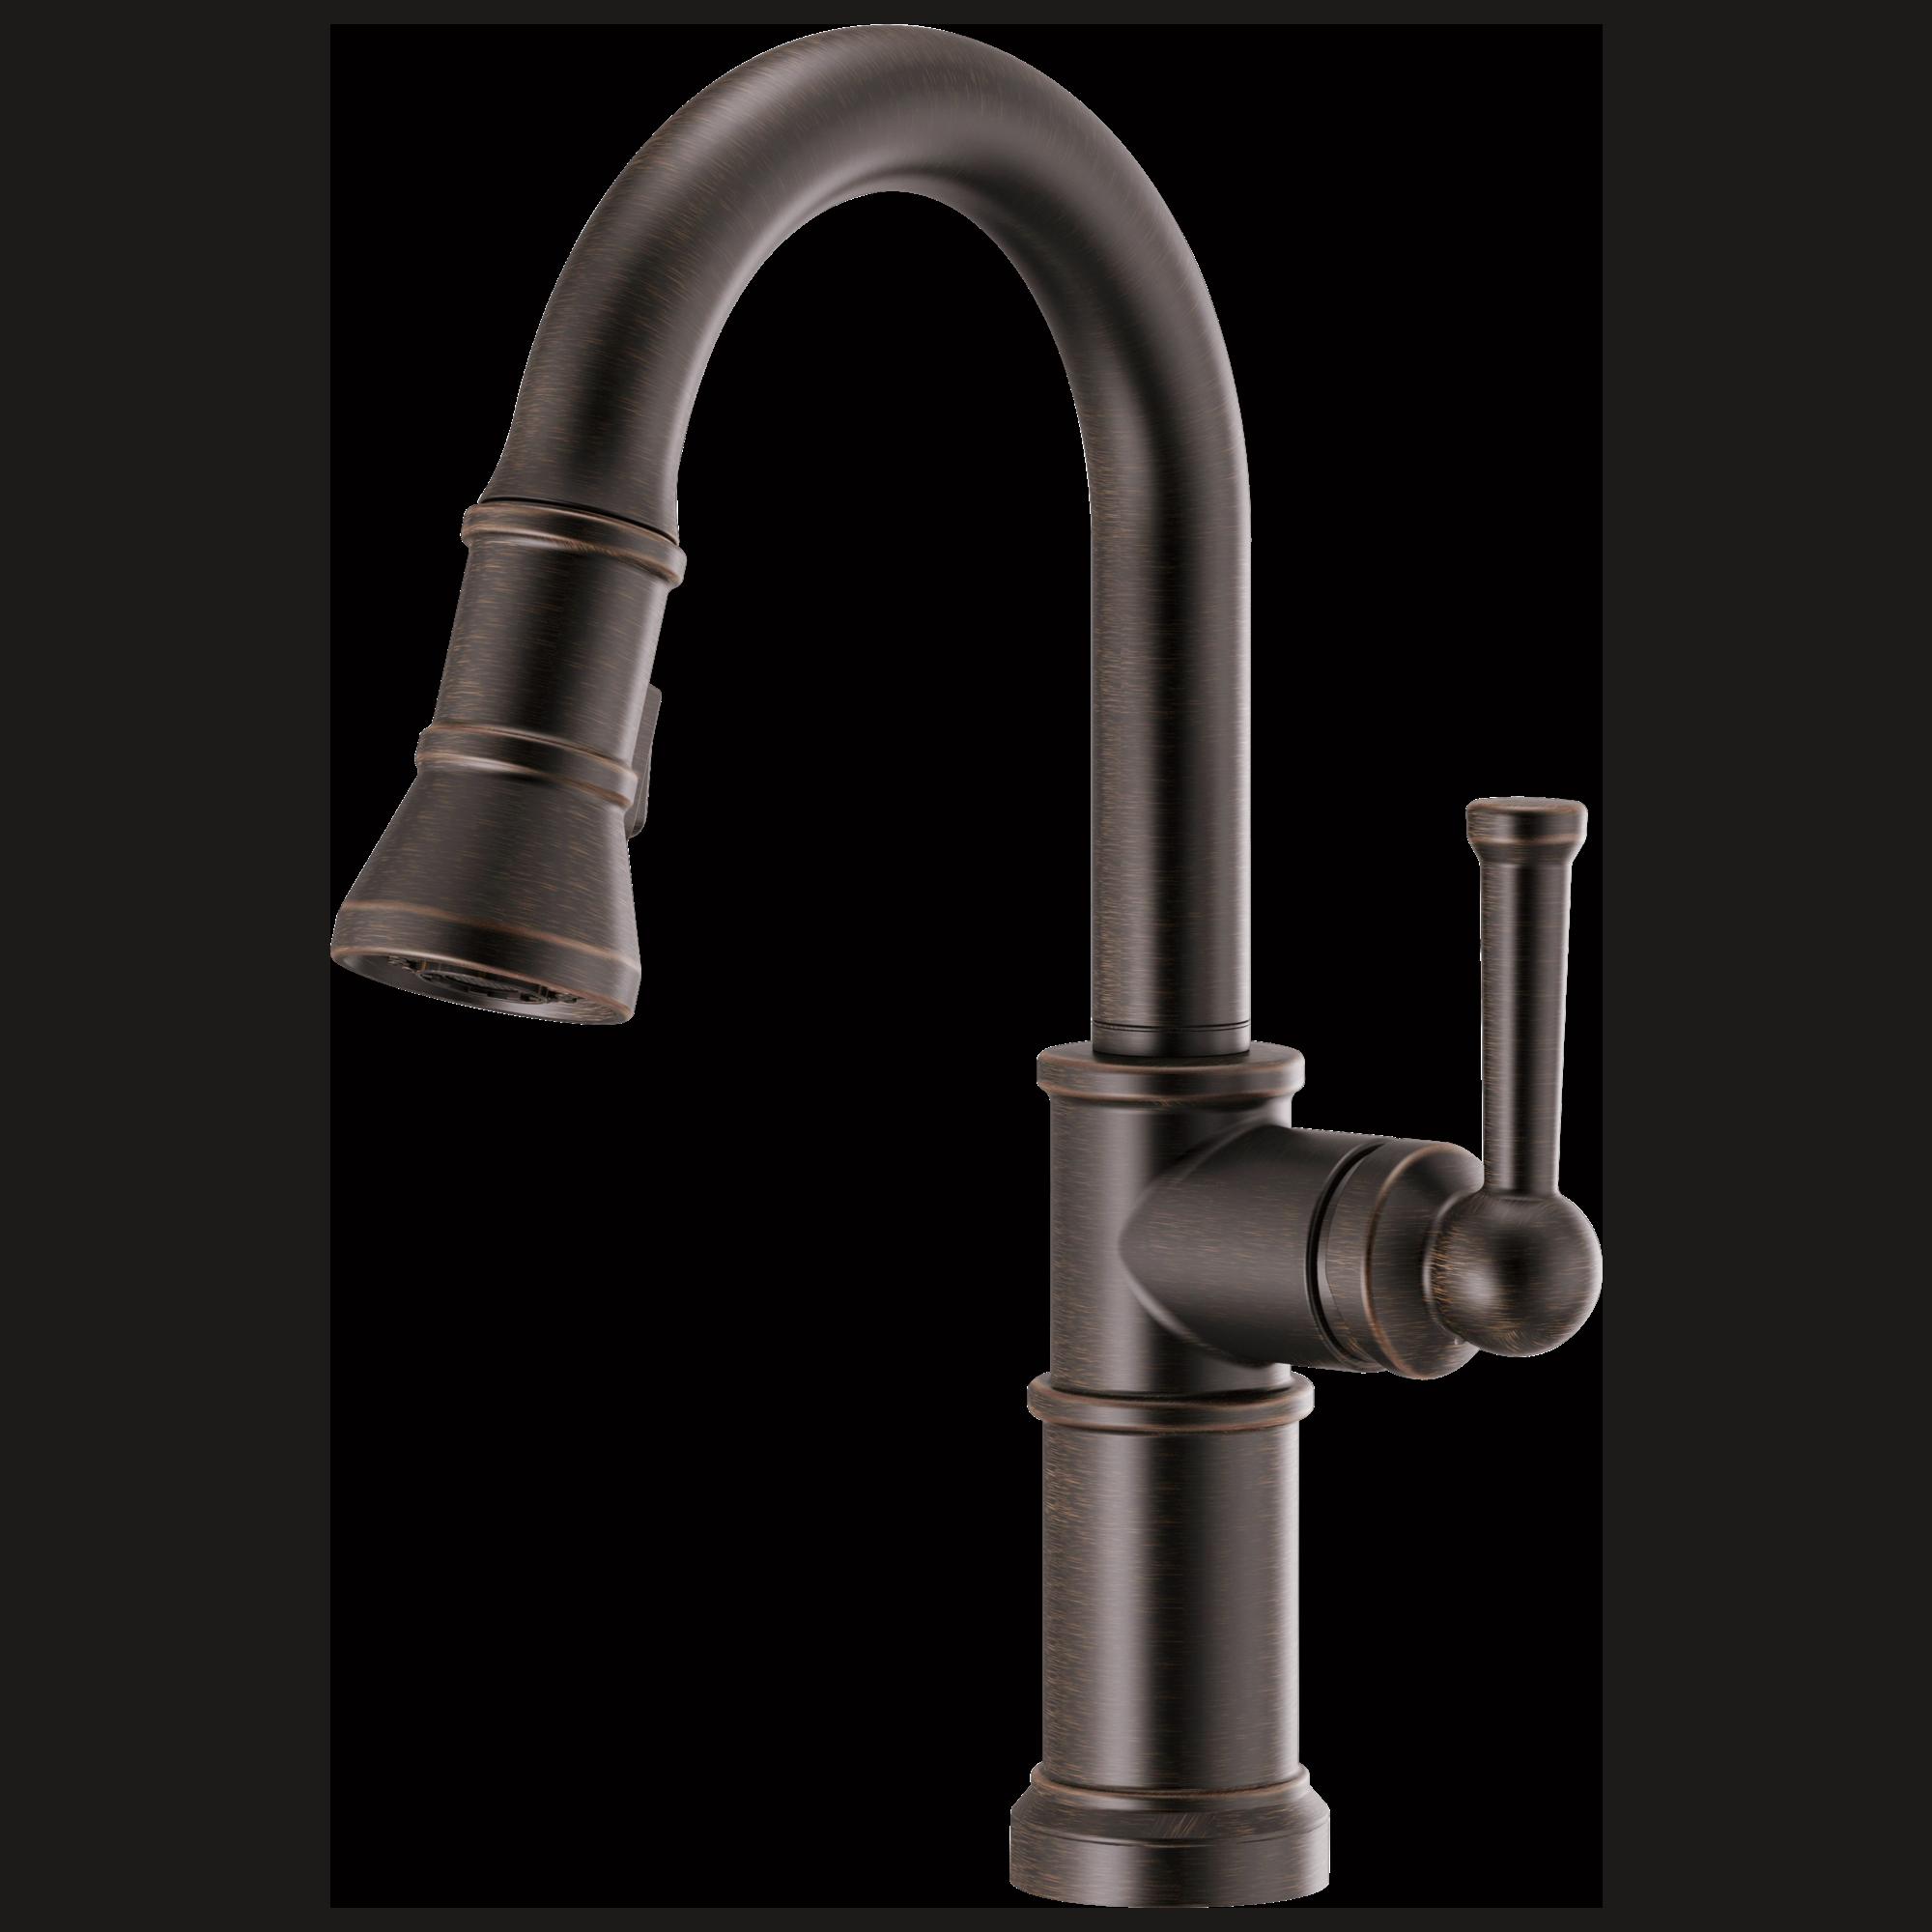 Brizo Artesso Prep Faucet Dupont Plumbing Supplies